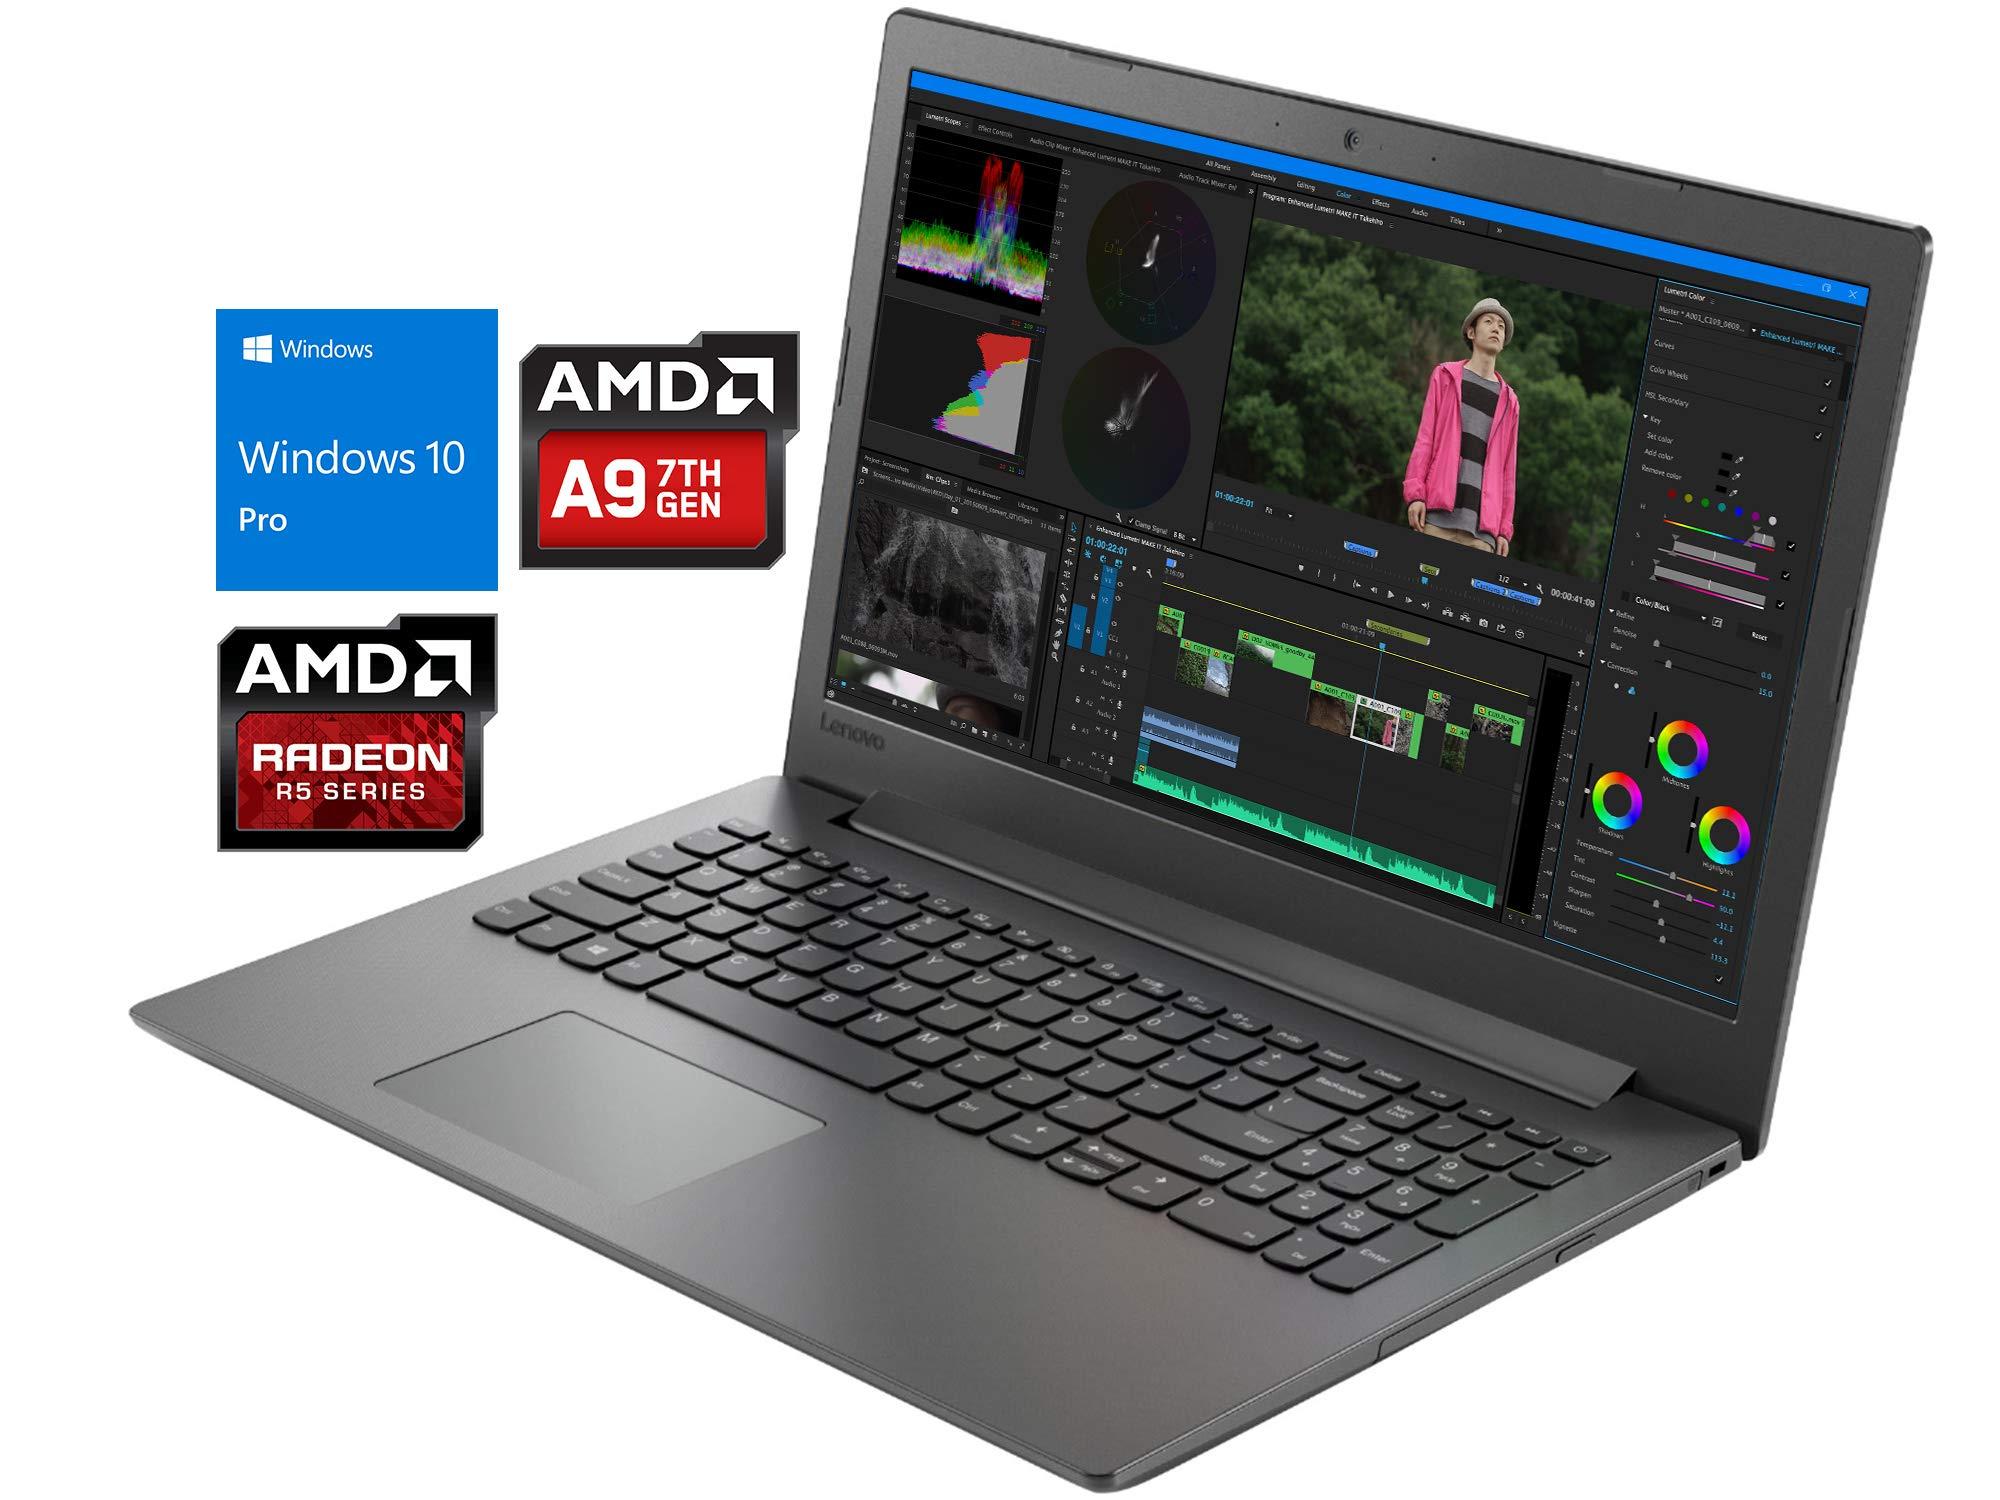 "Lenovo IdeaPad 130 Notebook, 15.6"" HD, AMD Dual-Core A9-9425 Upto 3.7GHz, DVD-RW, HDMI, Card Reader, Wi-Fi, Bluetooth, Windows 10 S (4GB RAM | 128GB SSD | Windows 10 Pro)."